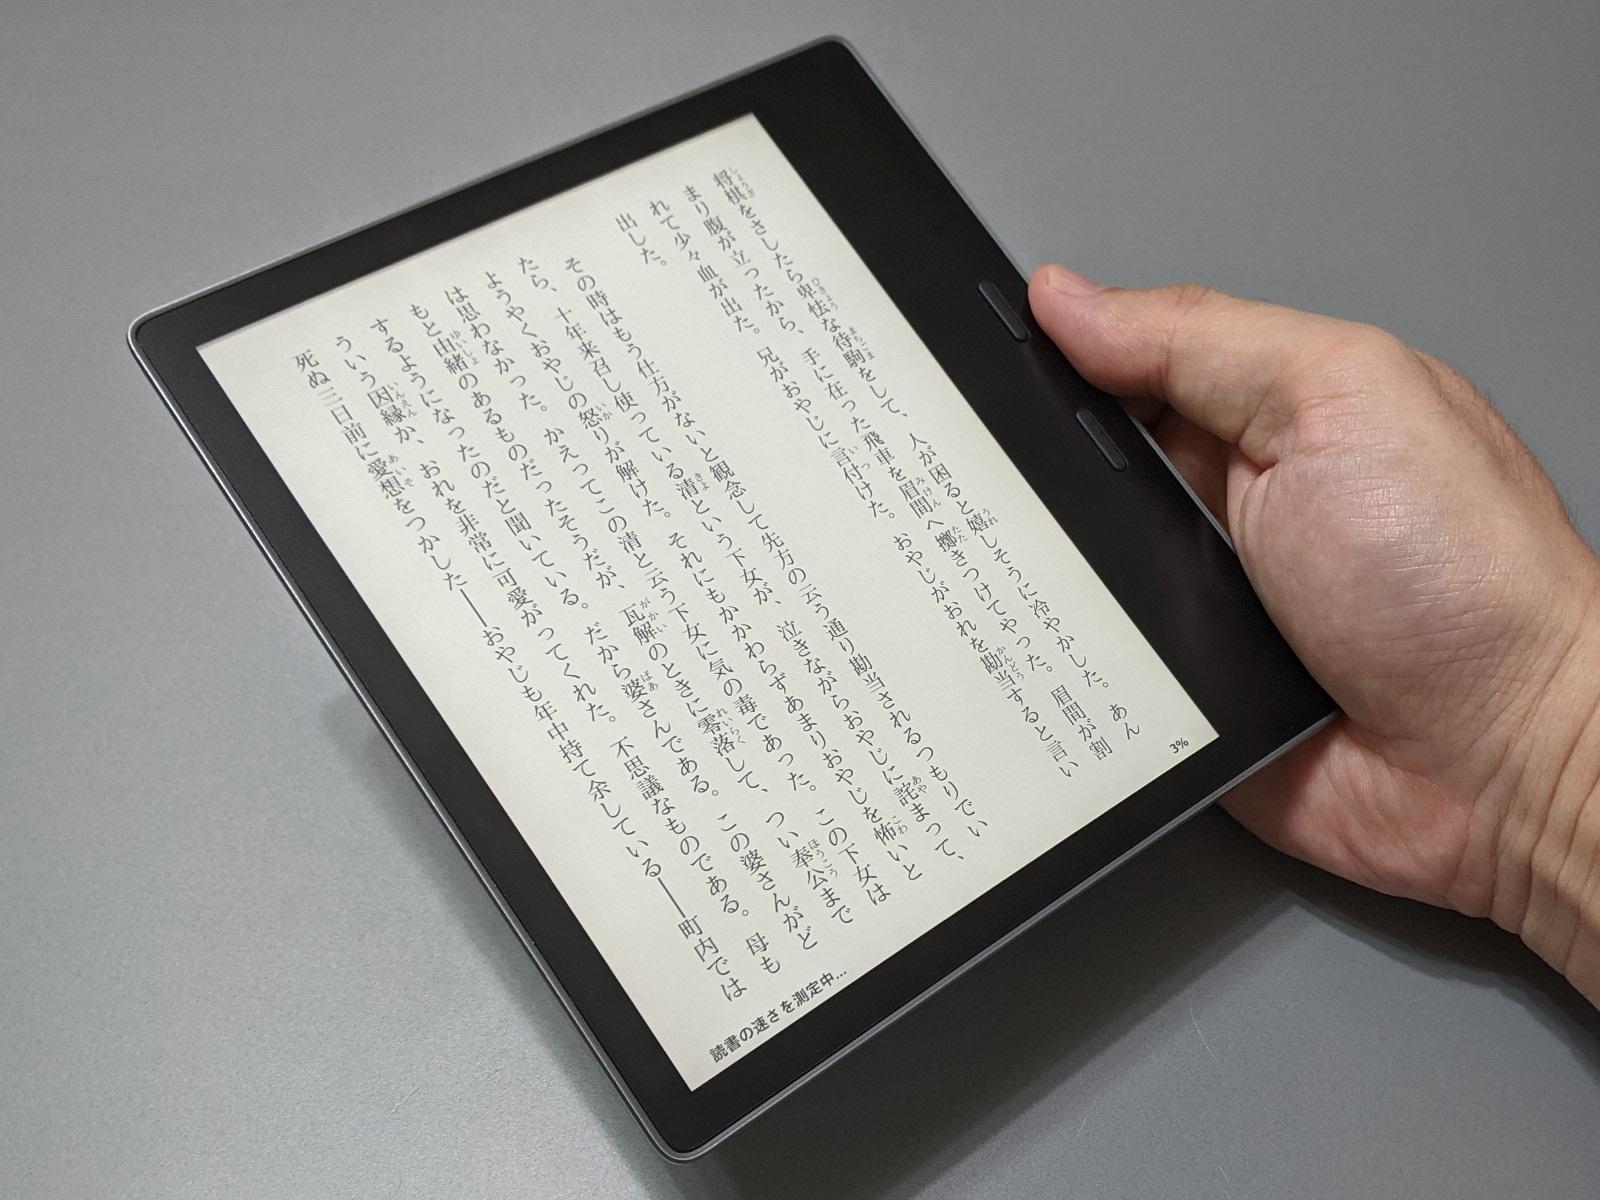 「Kindle Oasis」。タッチやスワイプのほか、専用ボタンでページがめくれるのも利点だ